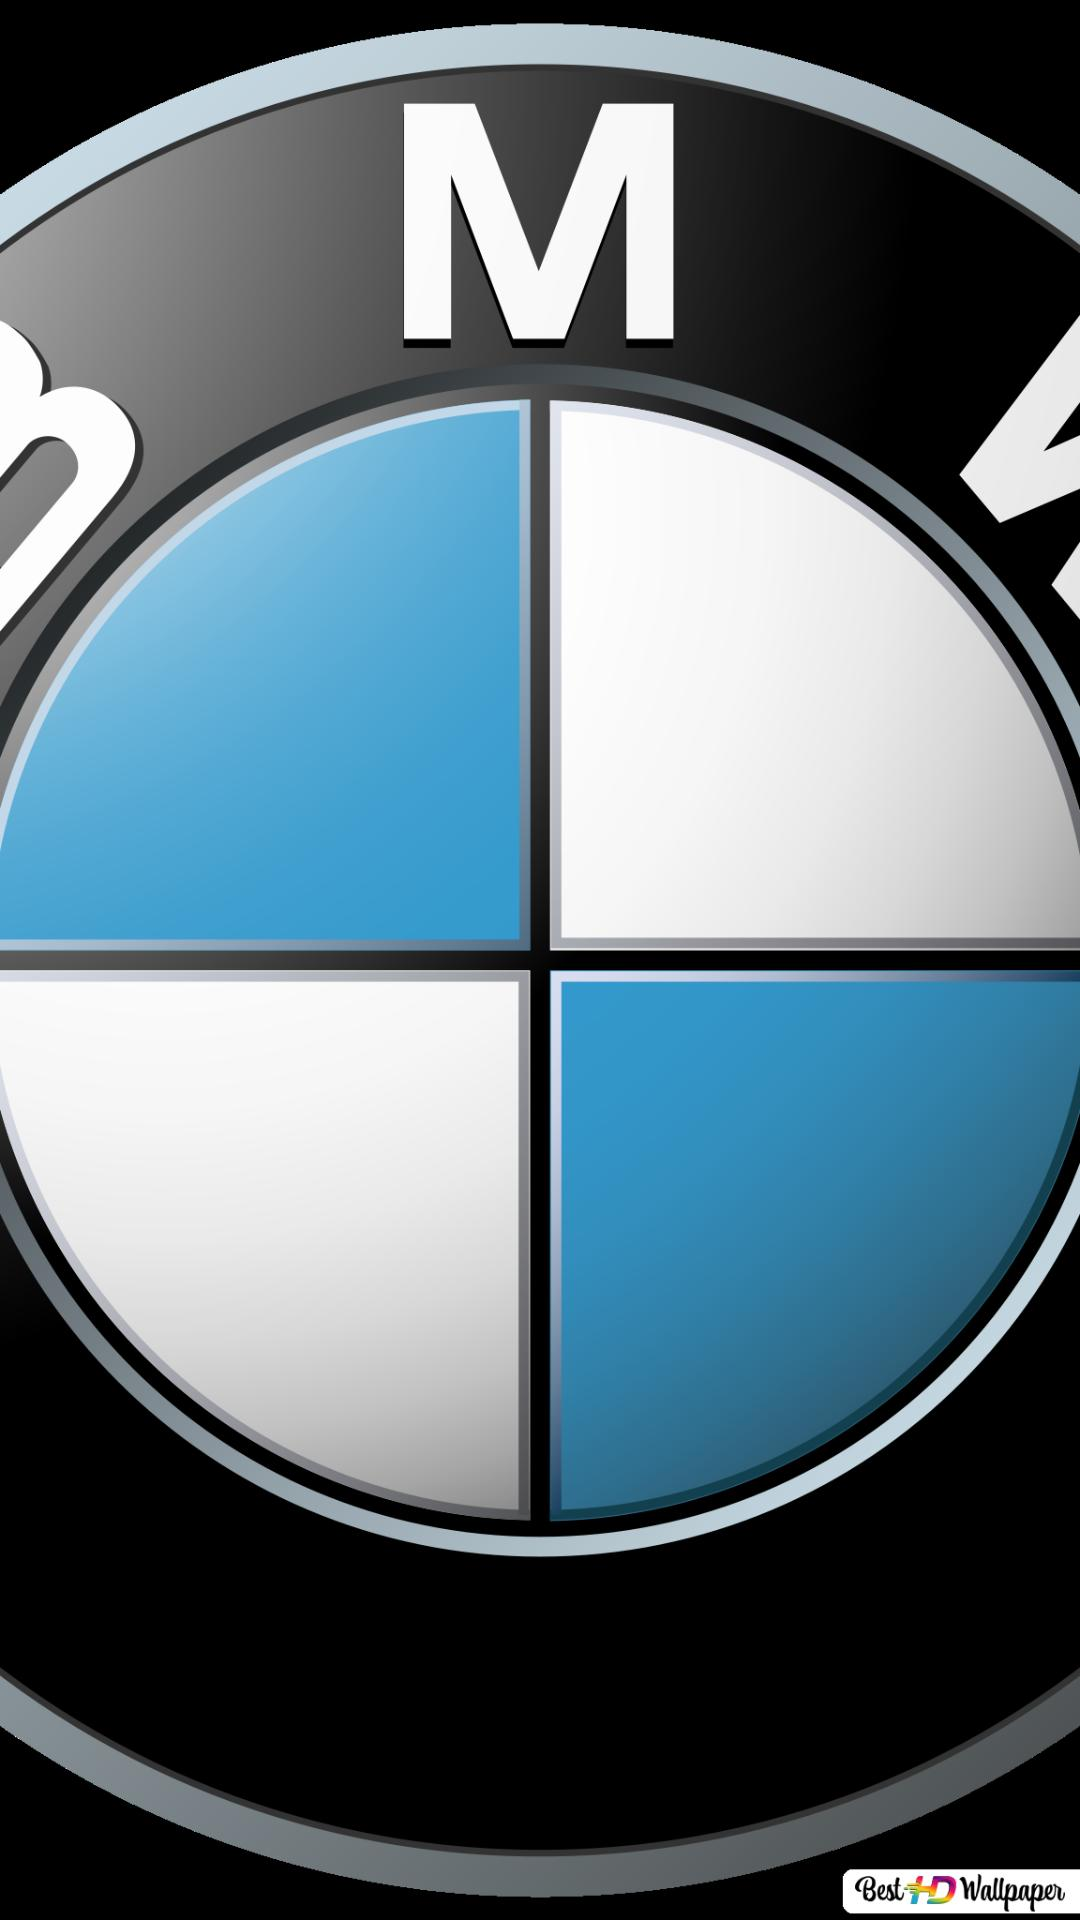 Bmw Orjinal Logo Hd Wallpaper Download